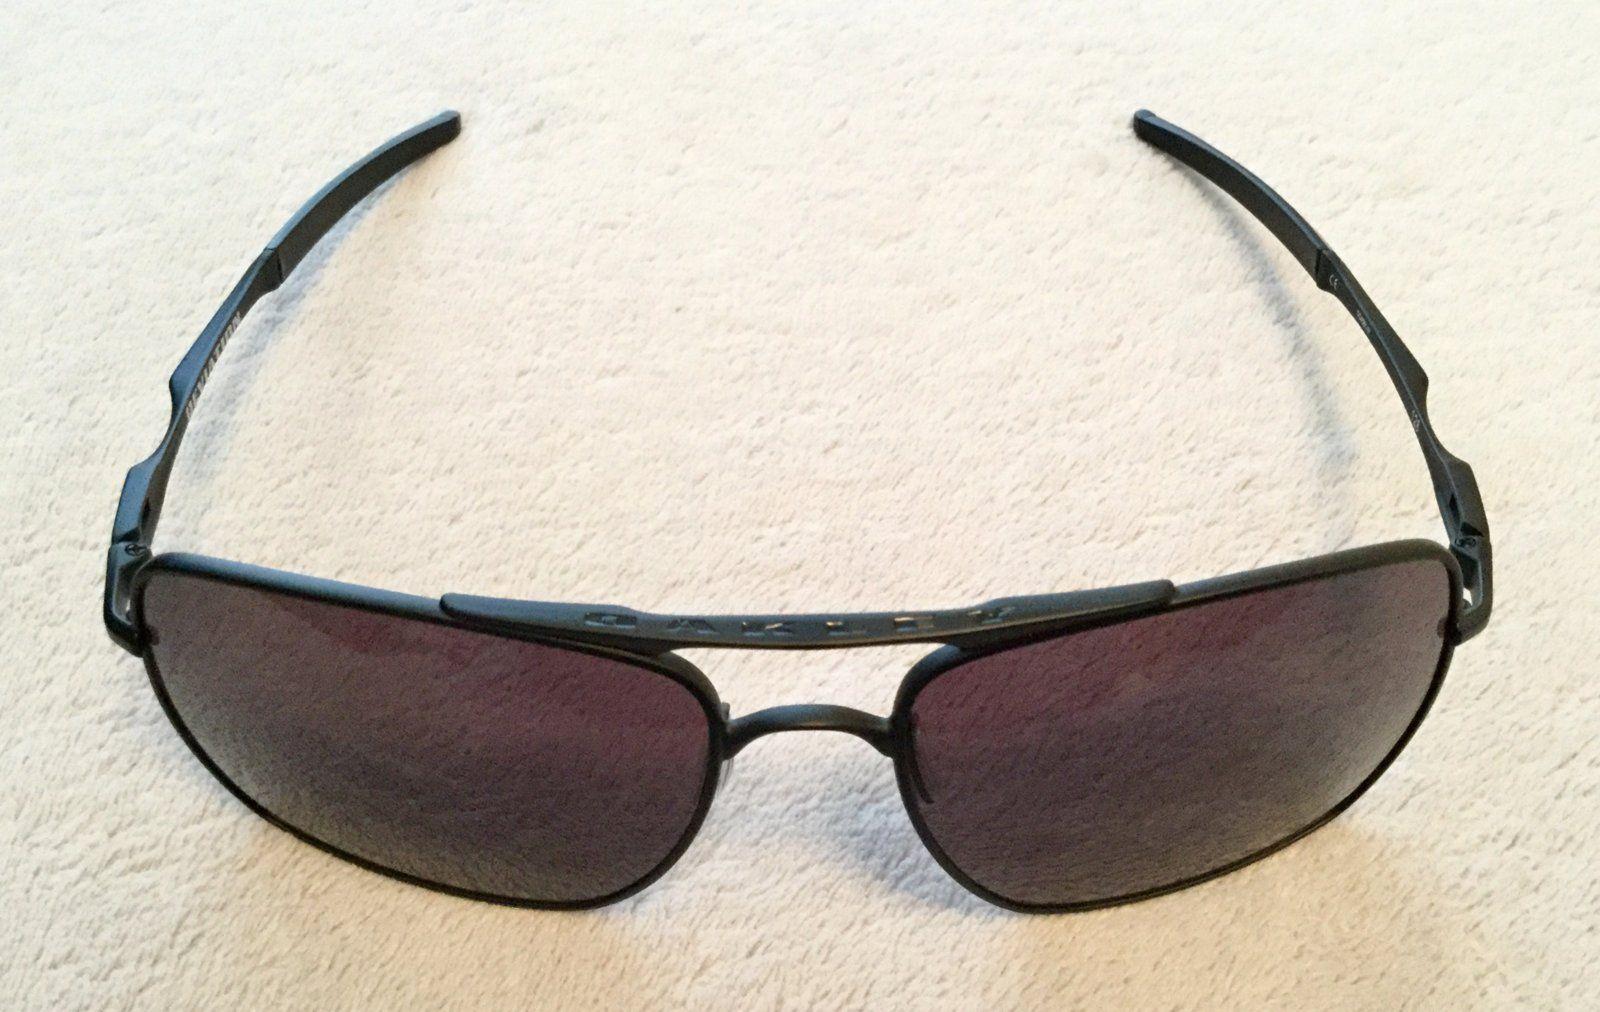 84914193c8 Oakley Deviation Sunglasses (New) - 6819F65E-7E03-4B2D-A37C-B075DD58DE81